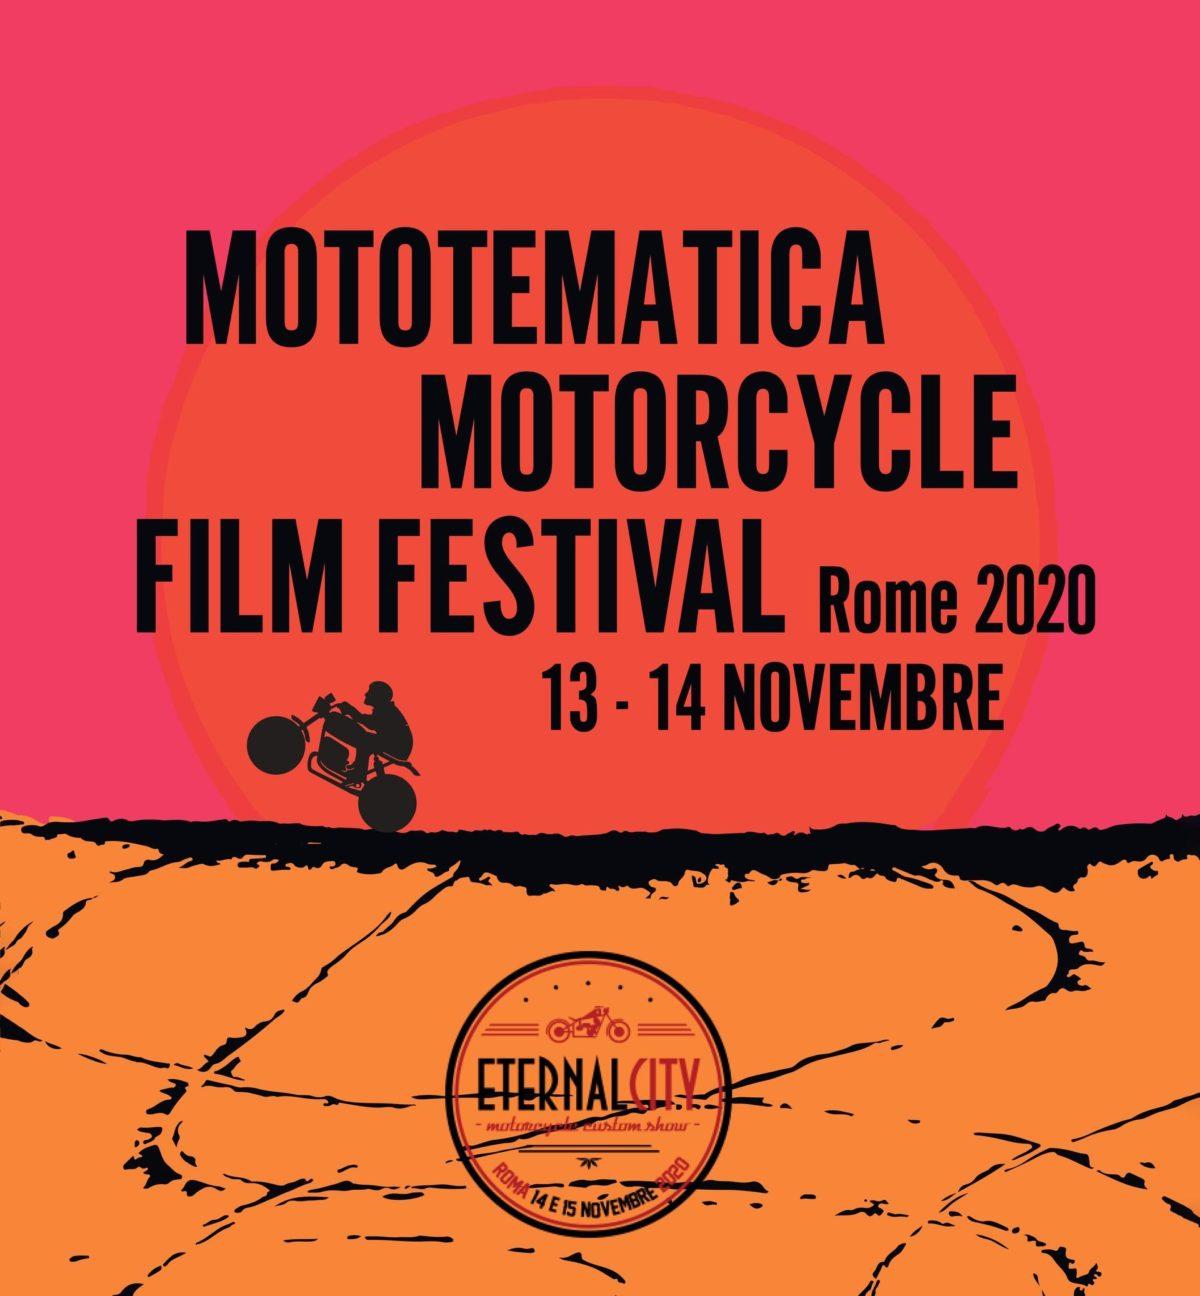 MotoTematica